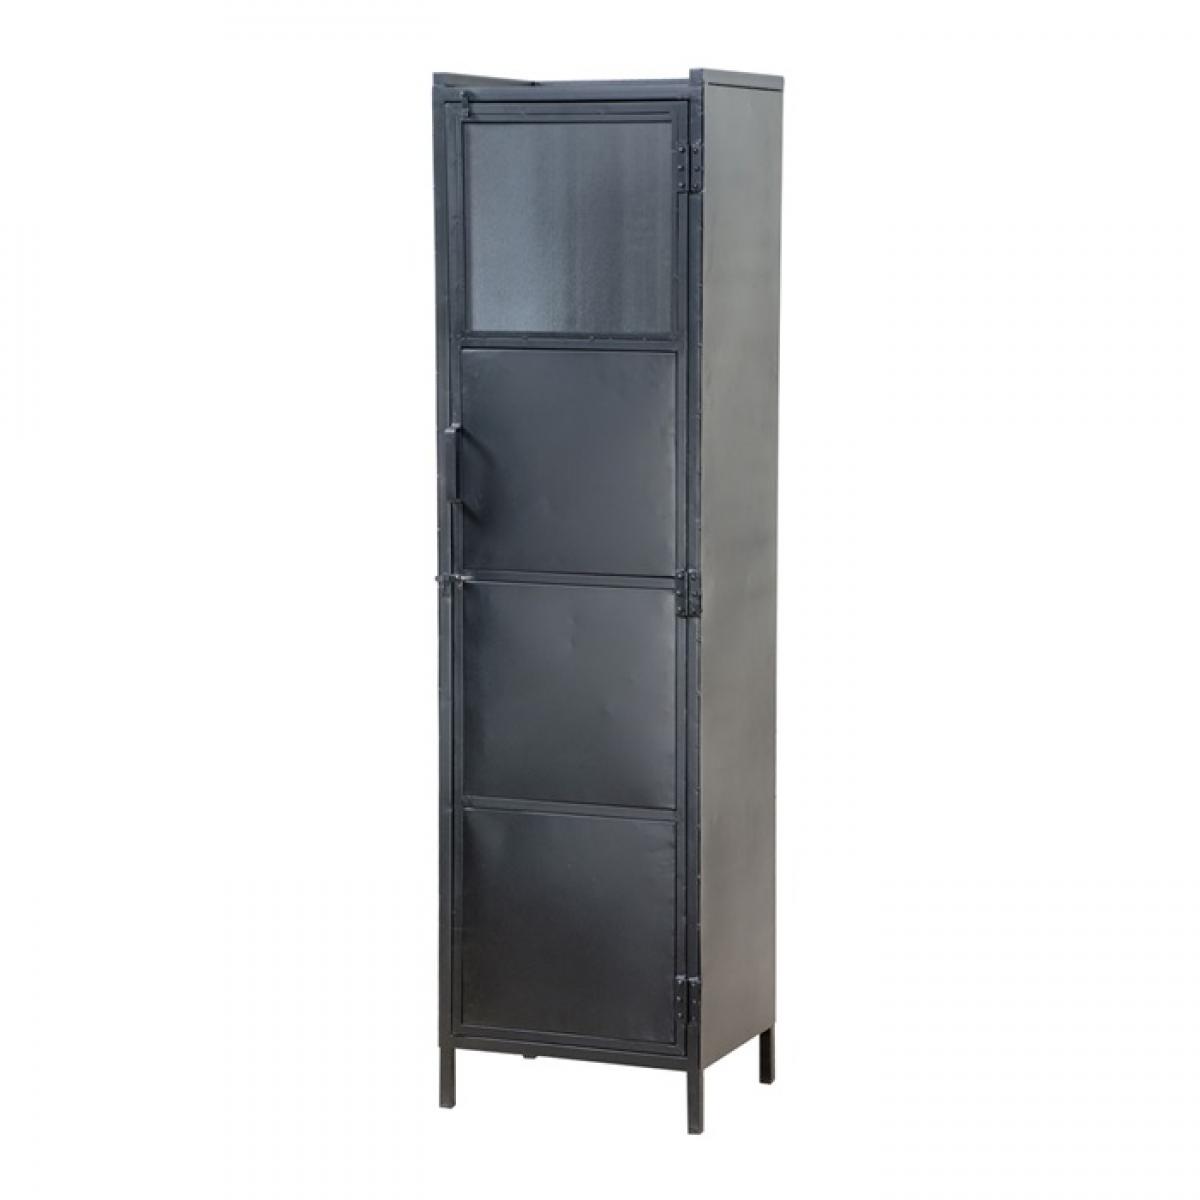 bergkast-boekenkast-ijzer-metaal-industrieel-eleonora-miltonhouse-1drs